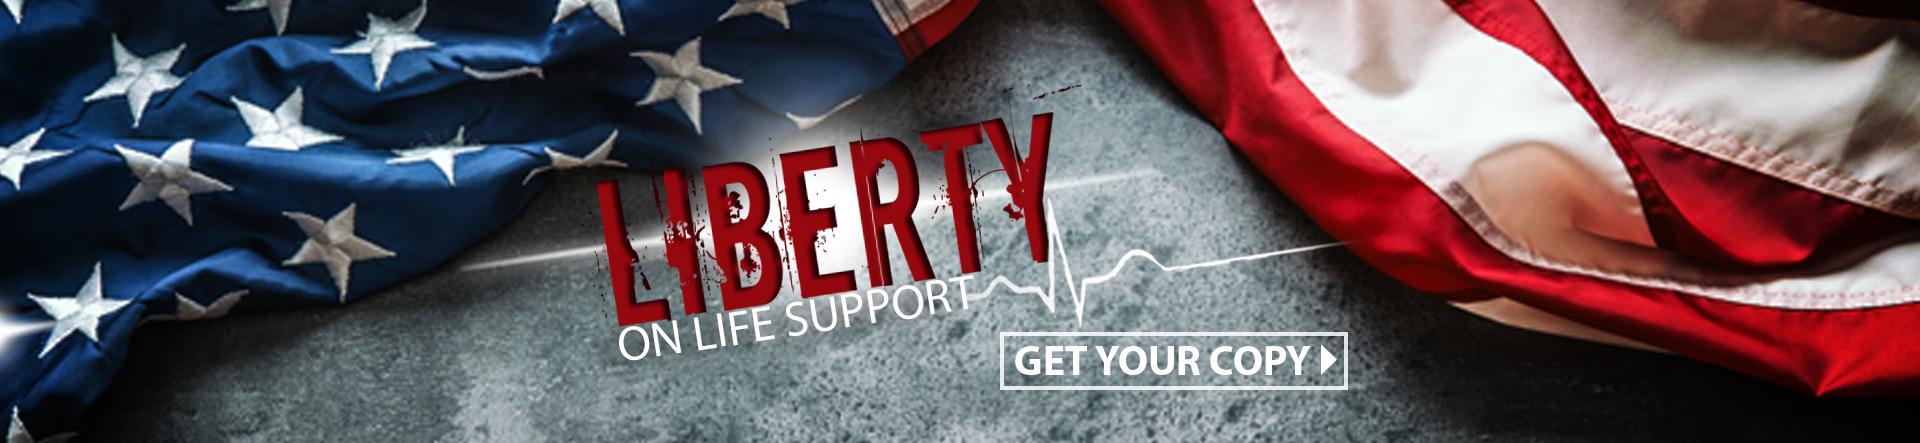 libertyOnLifeSupport-Slide